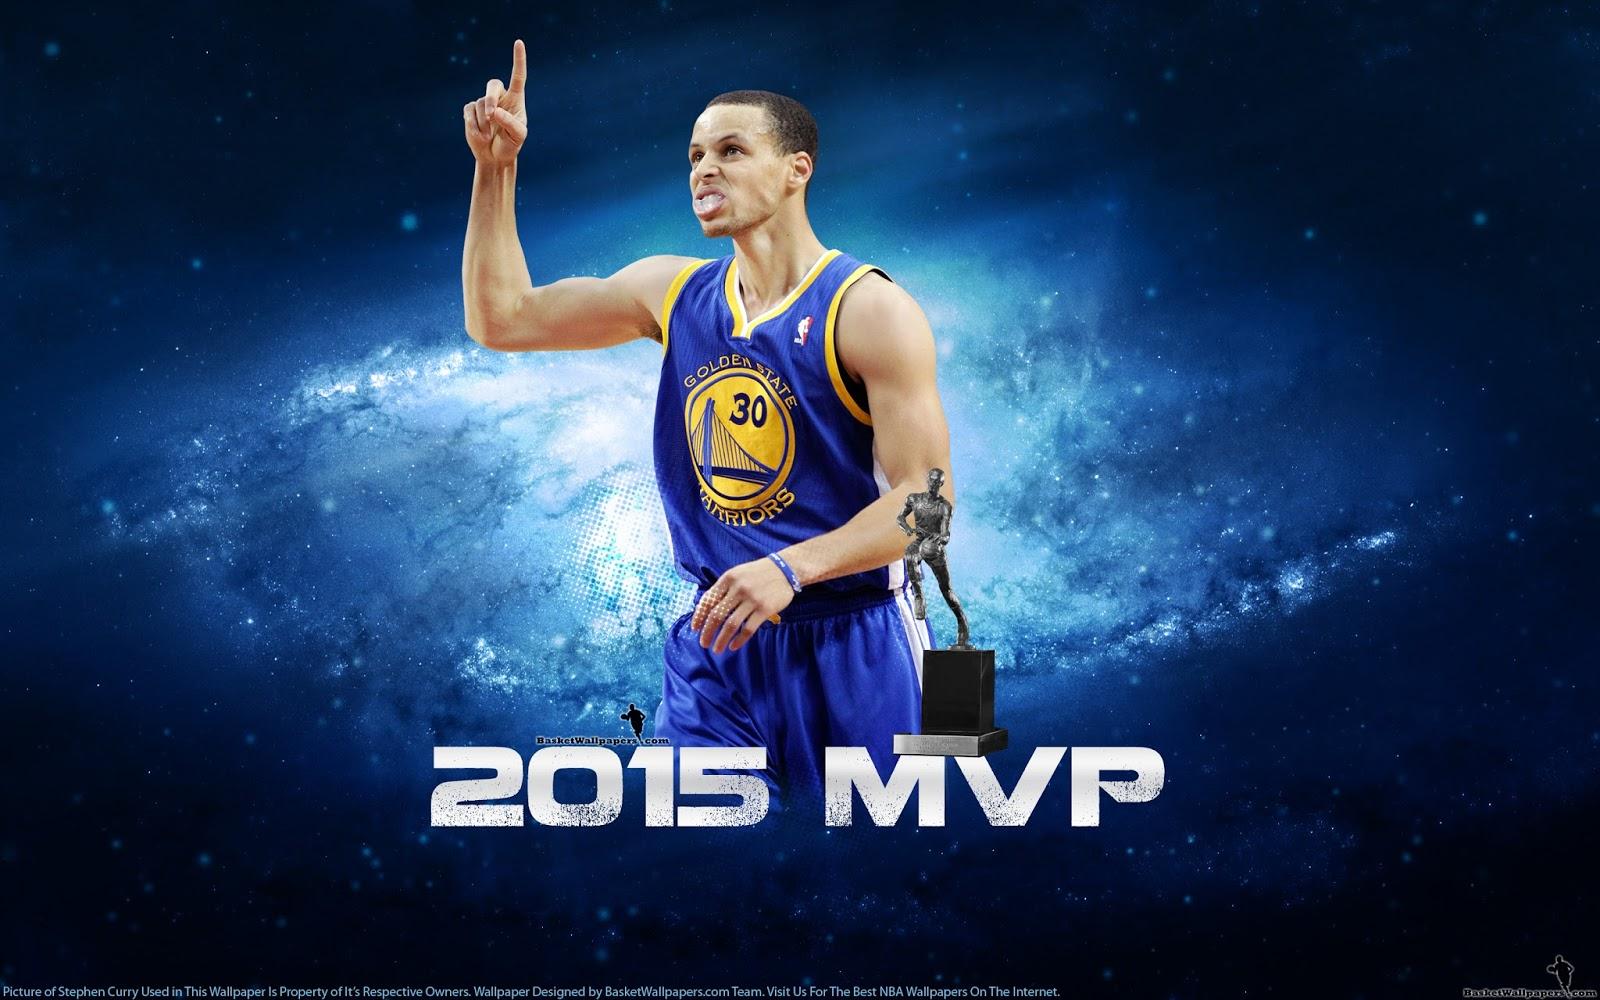 2015 MVP Stephen Curry Wallpaper HD